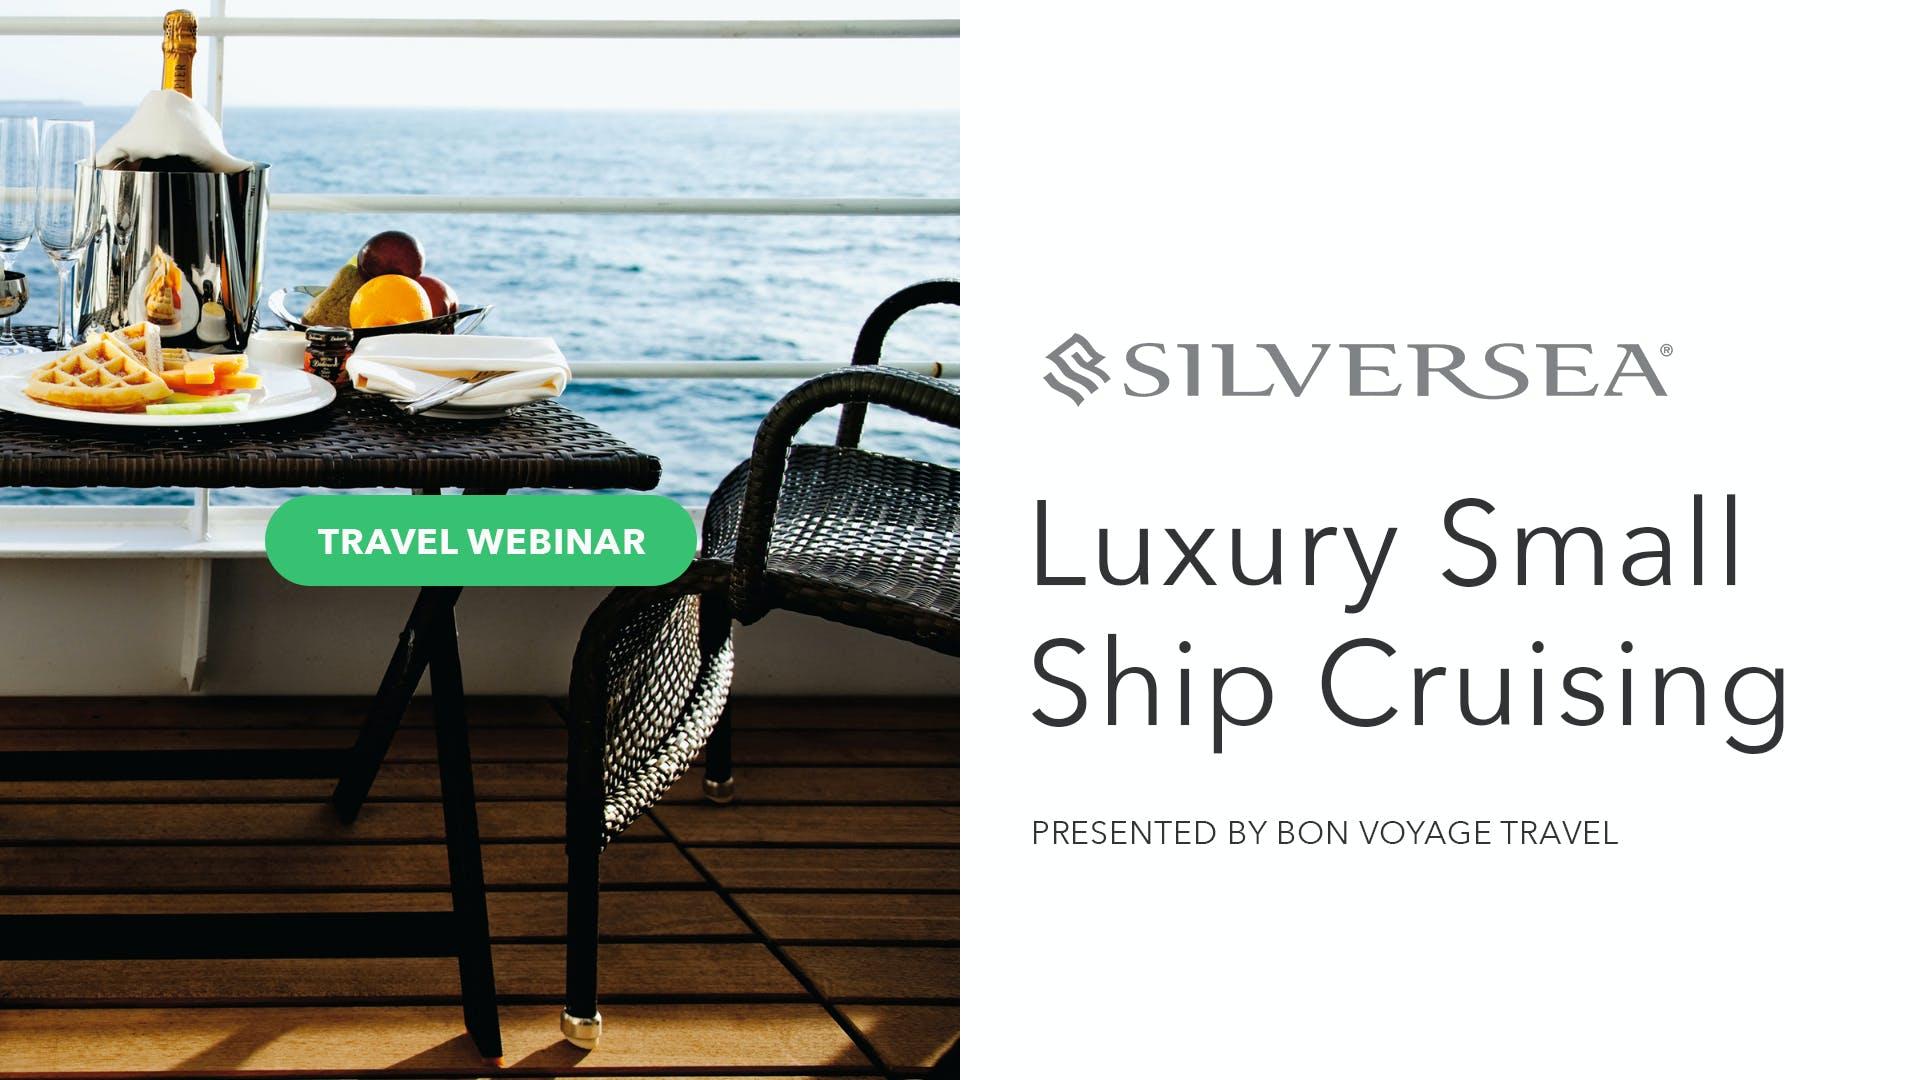 Luxury Small Ship Cruising with Silversea